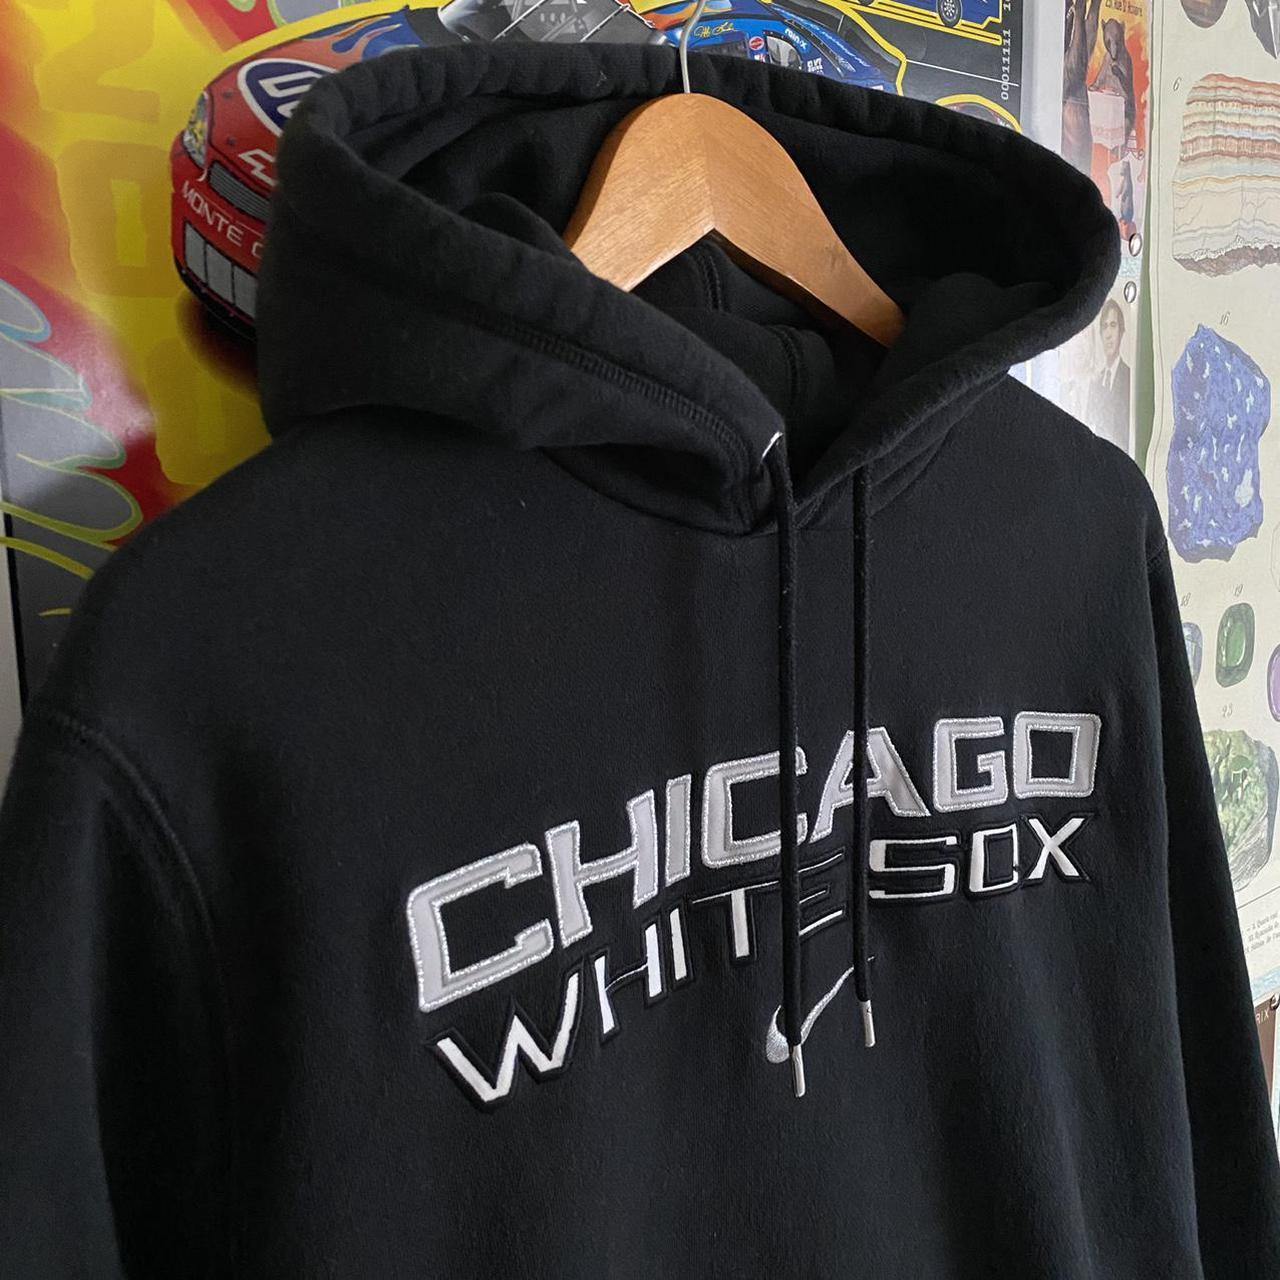 Product Image 1 - Men's size xl  Chicago white